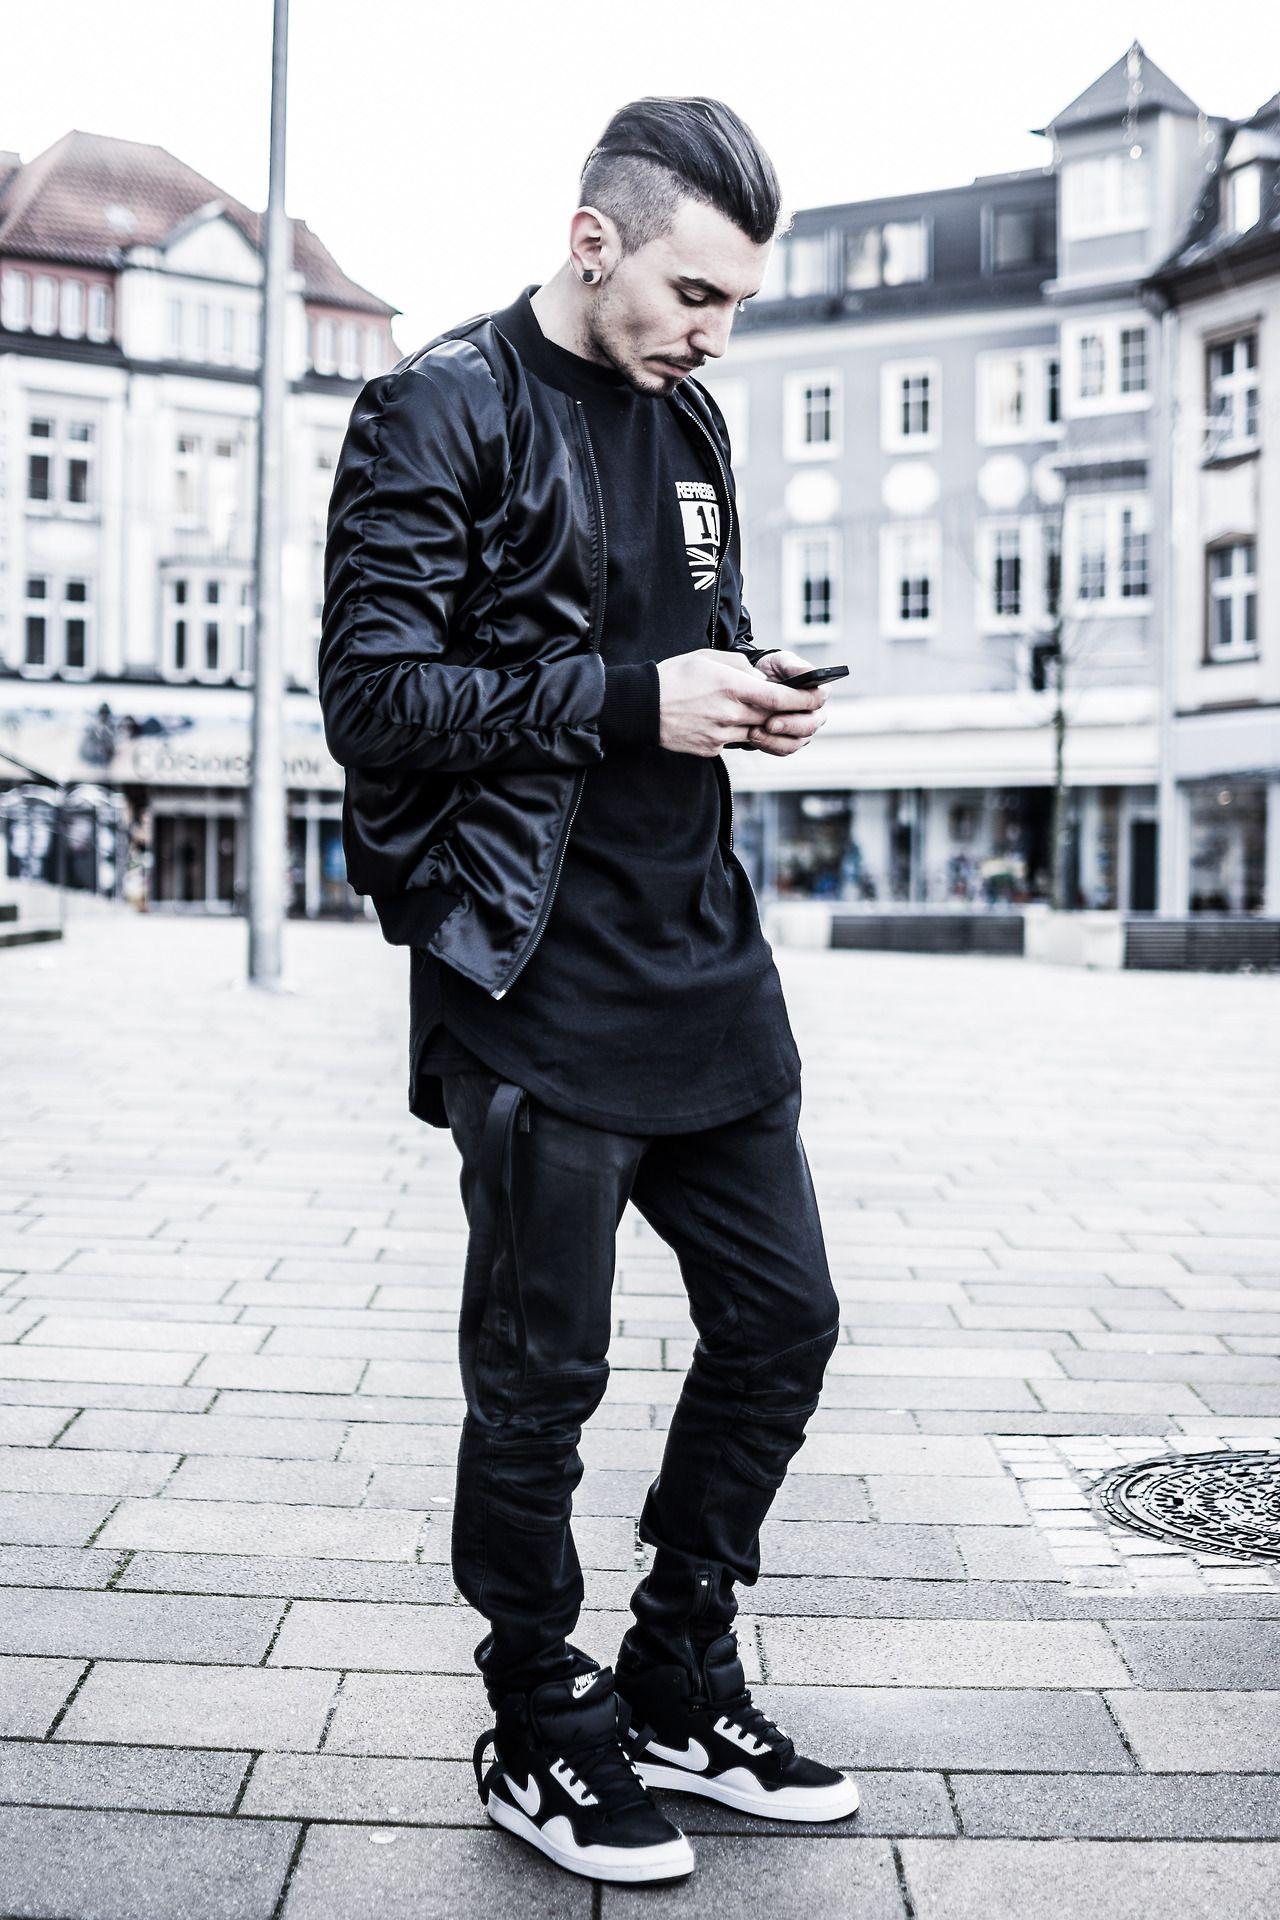 470ce2ce554 All Black Everything | Fashion | Sko, Swag, Tøj